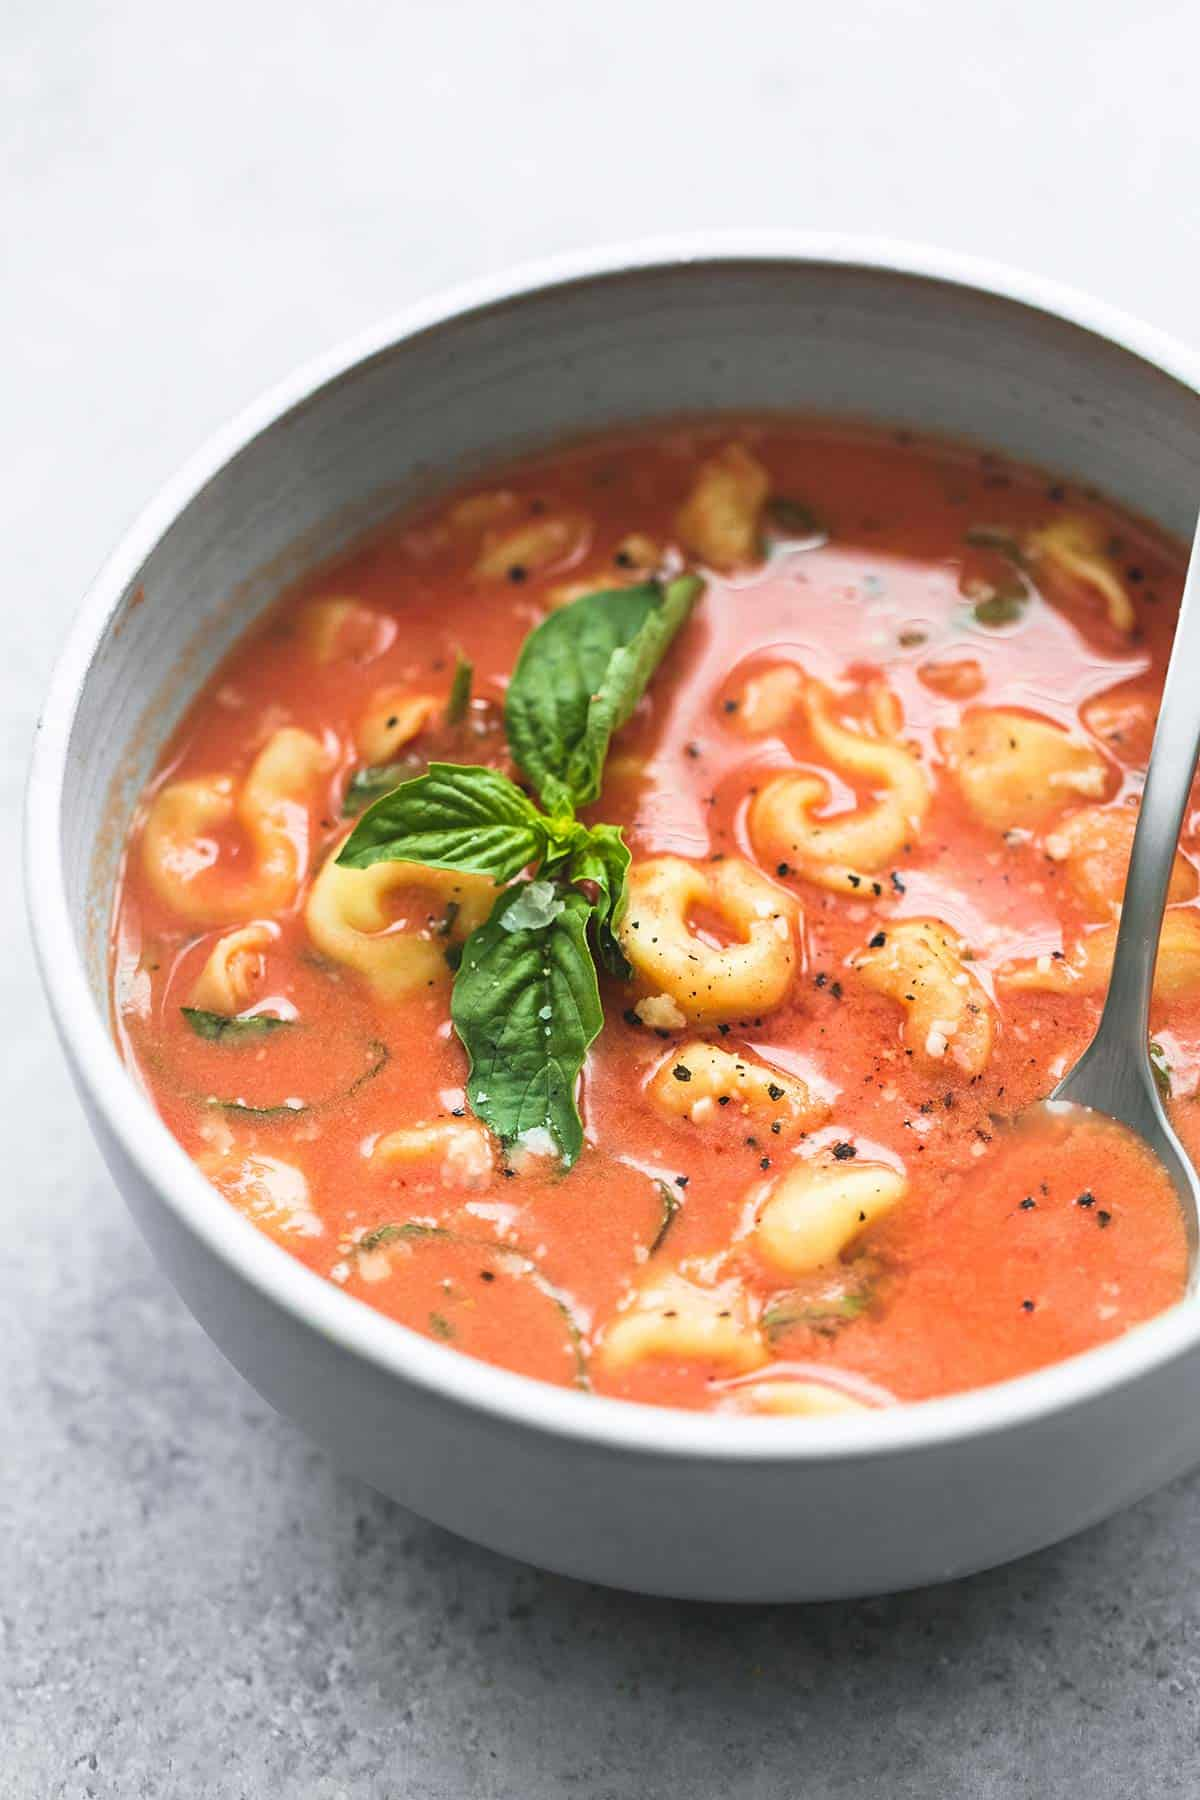 Slow Cooker Tomato Basil Parmesan Tortellini Soup | lecremedelacrumb.com